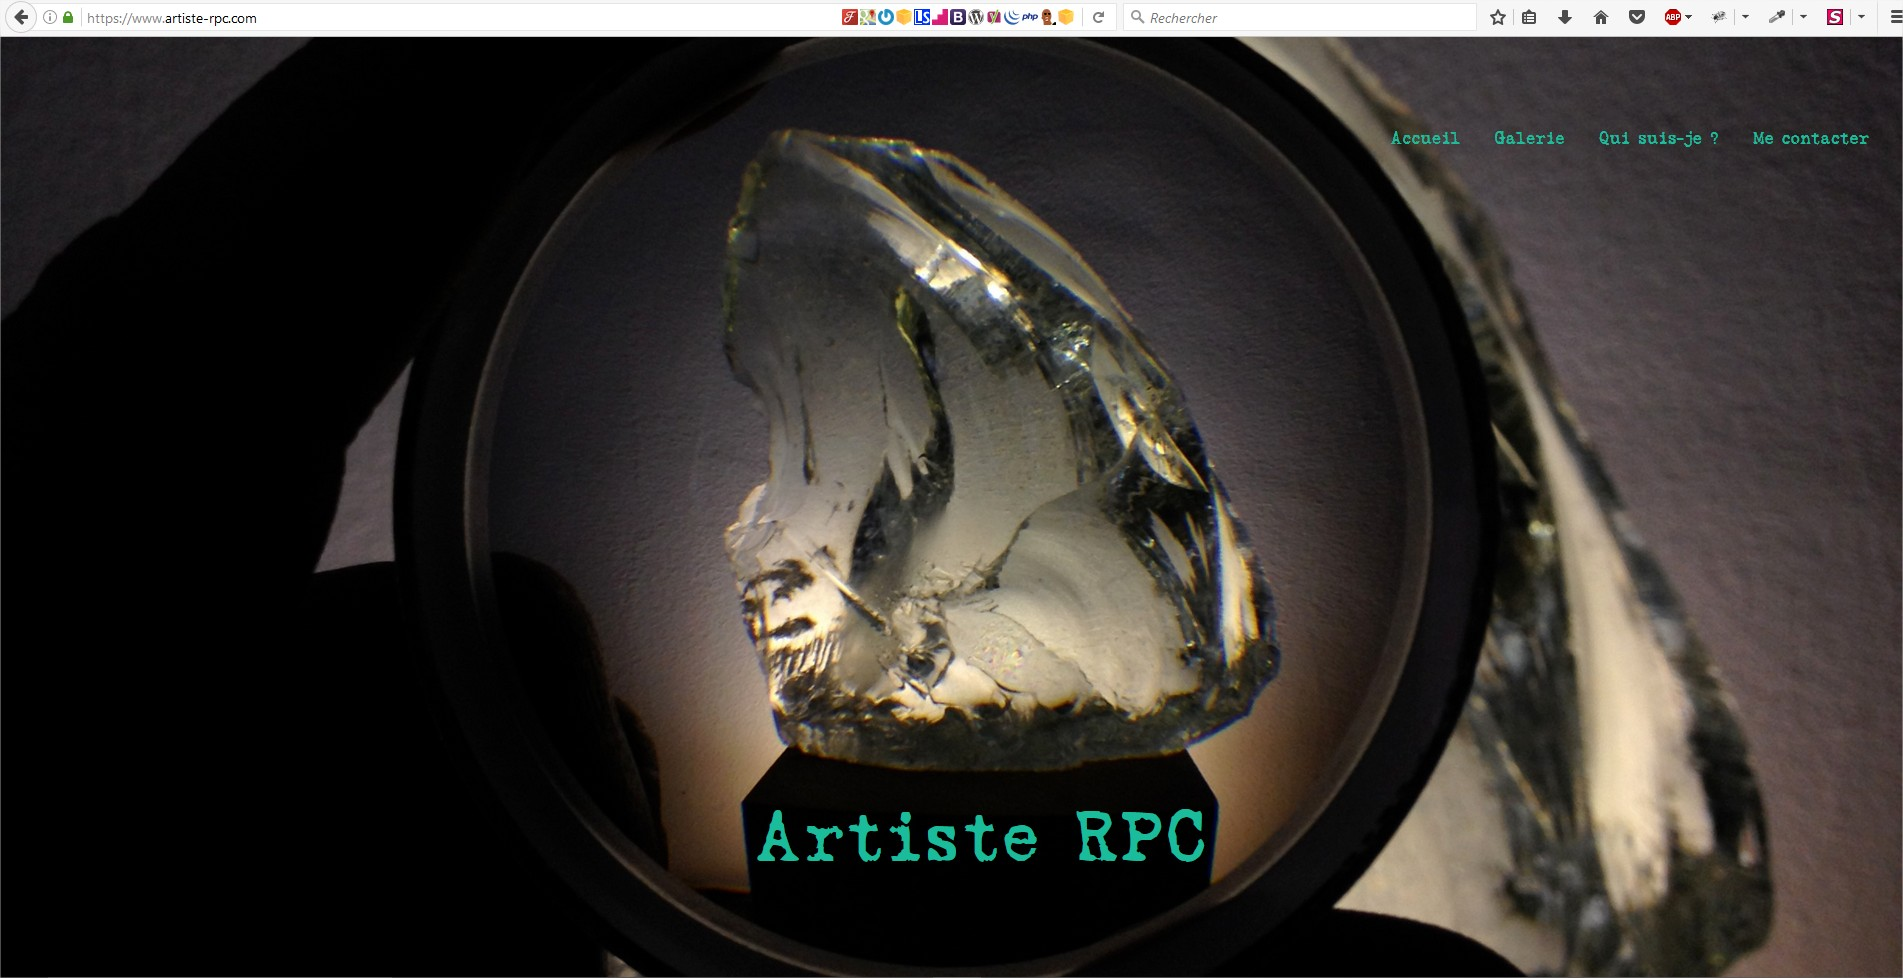 Artiste-rpc-Mozilla-Firefox